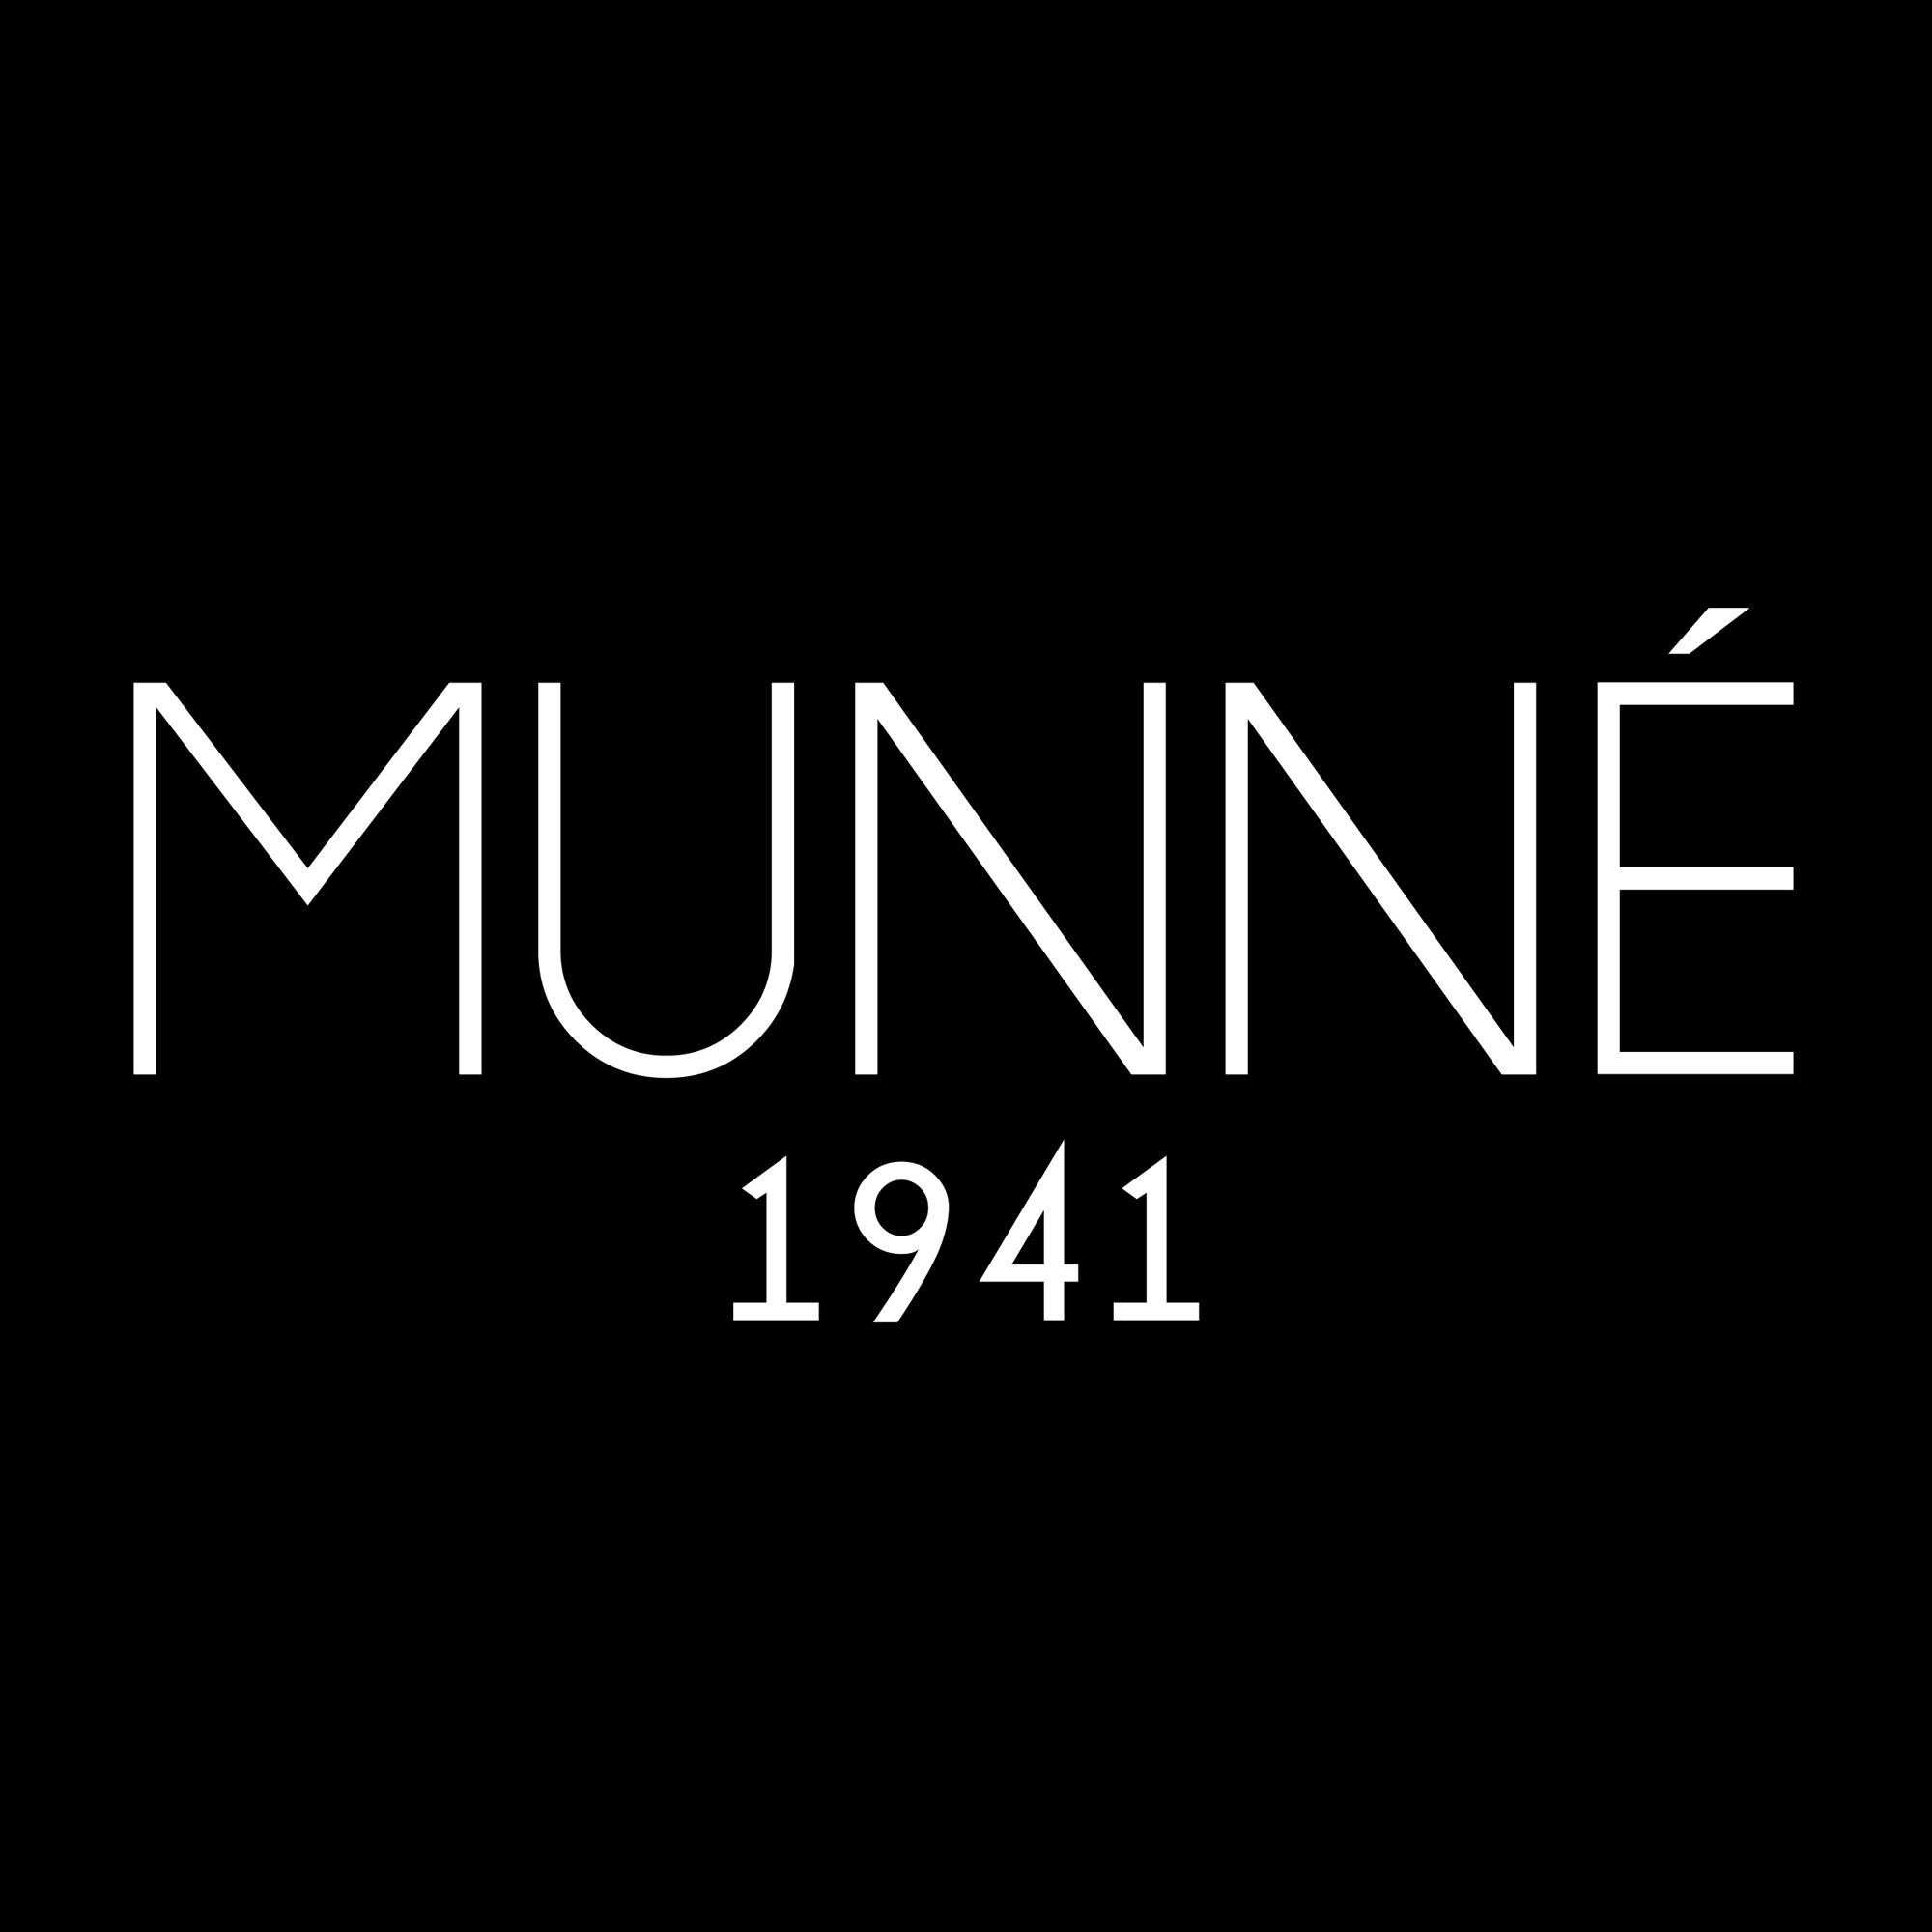 Logo comerç CALÇATS MUNNÉ (La Vailet)